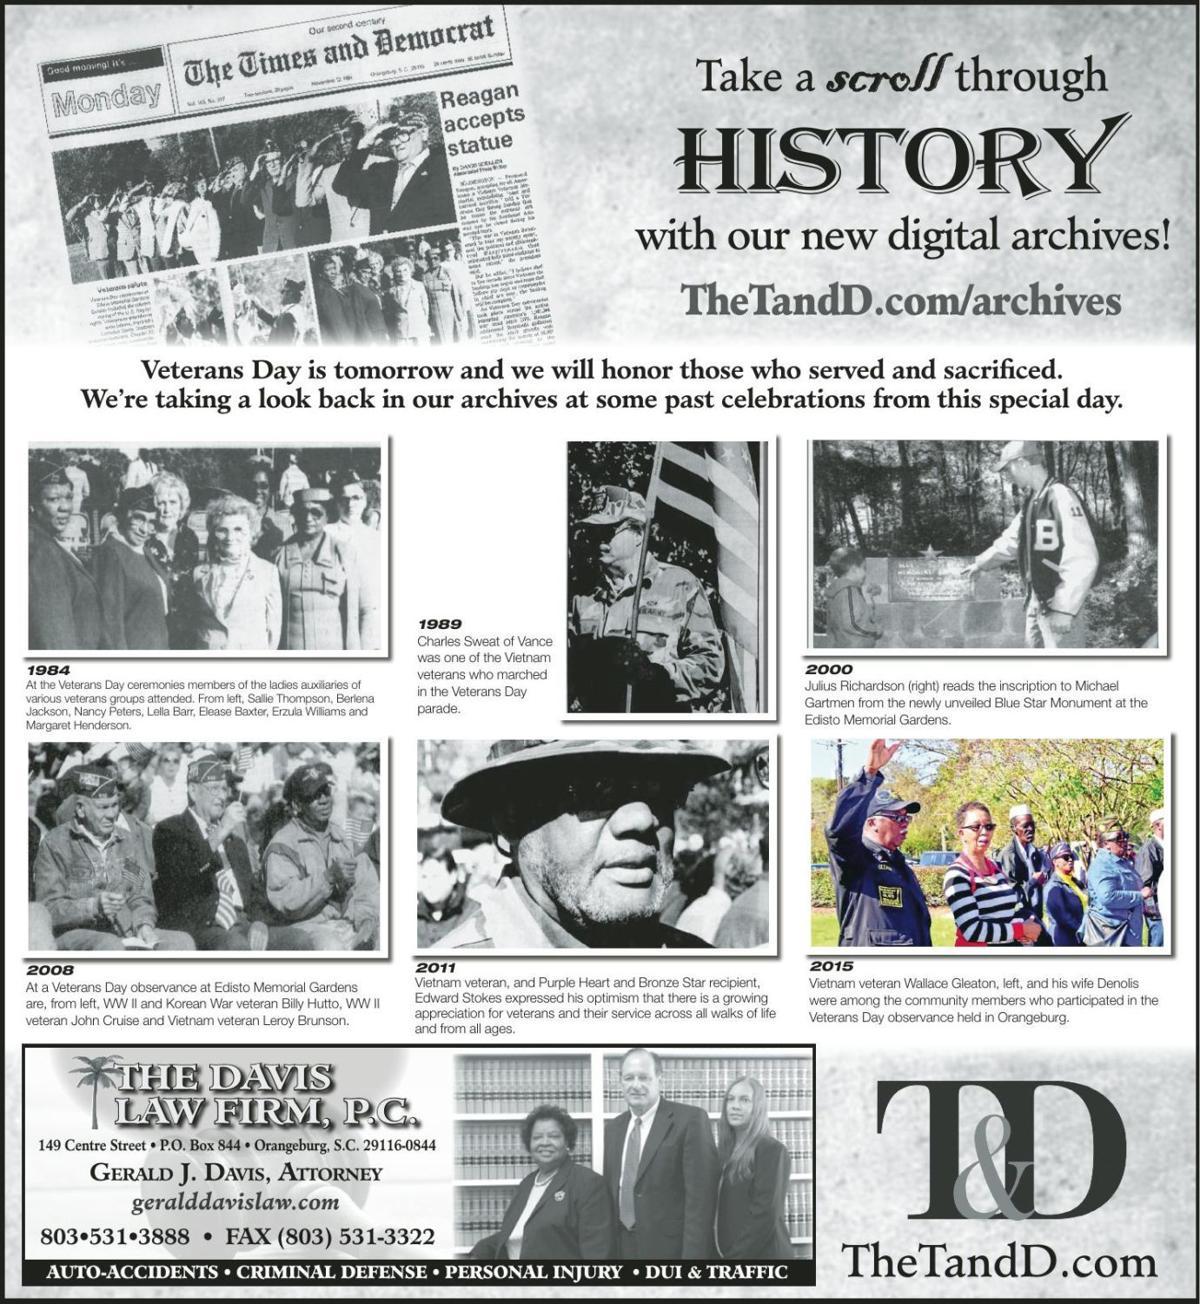 TheTandD.com/archives Nov. 10, 2019